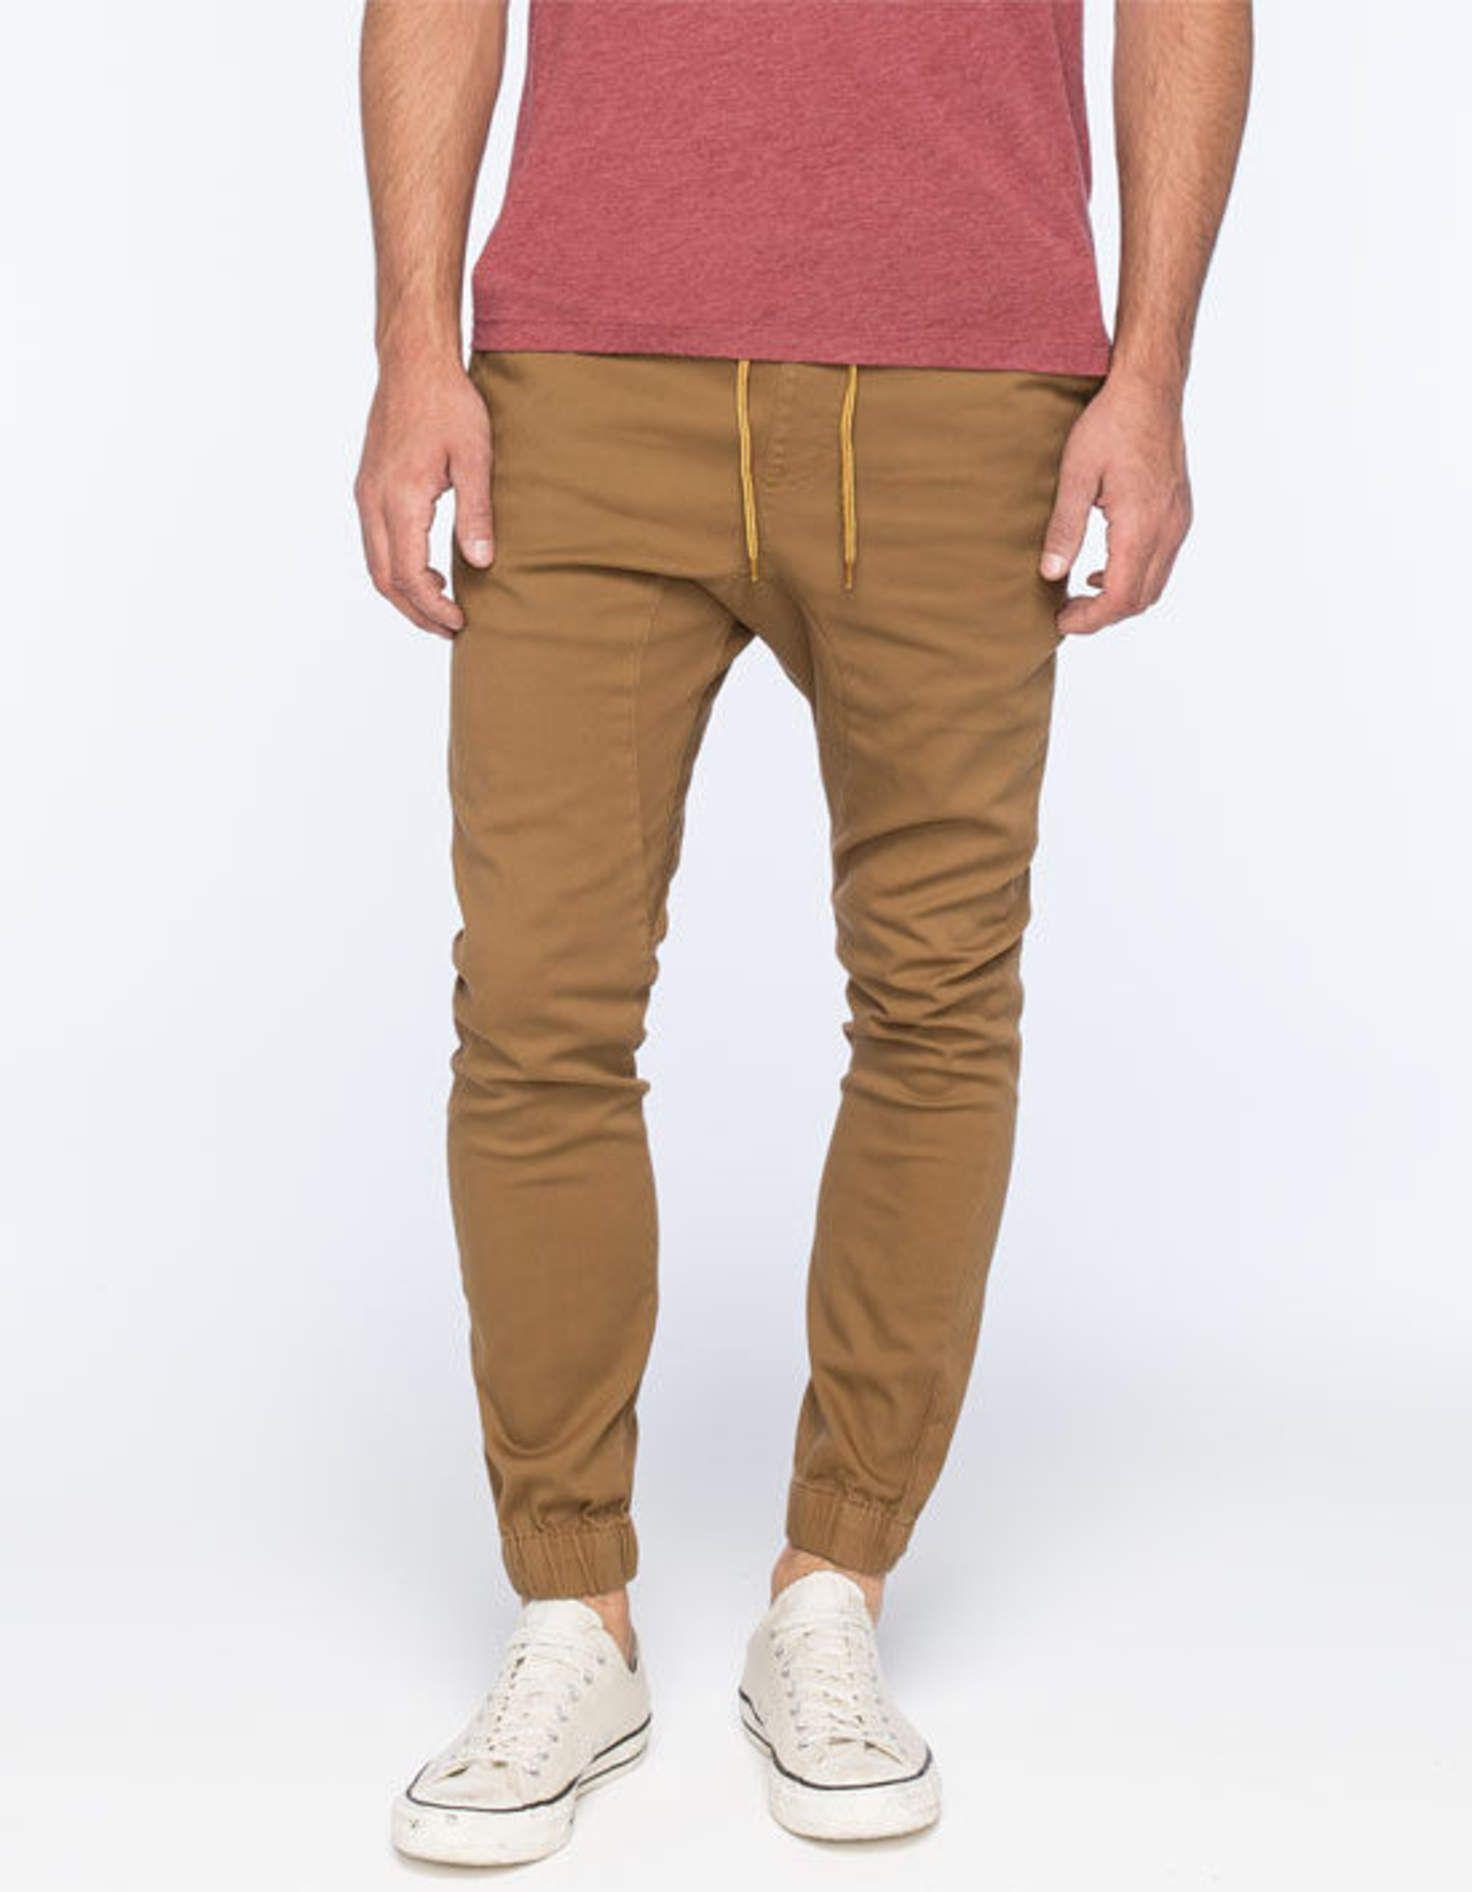 d7346ff1e754 Lira Weekend Mens Jogger Pants Khaki In Sizes   Style   Mens joggers ...